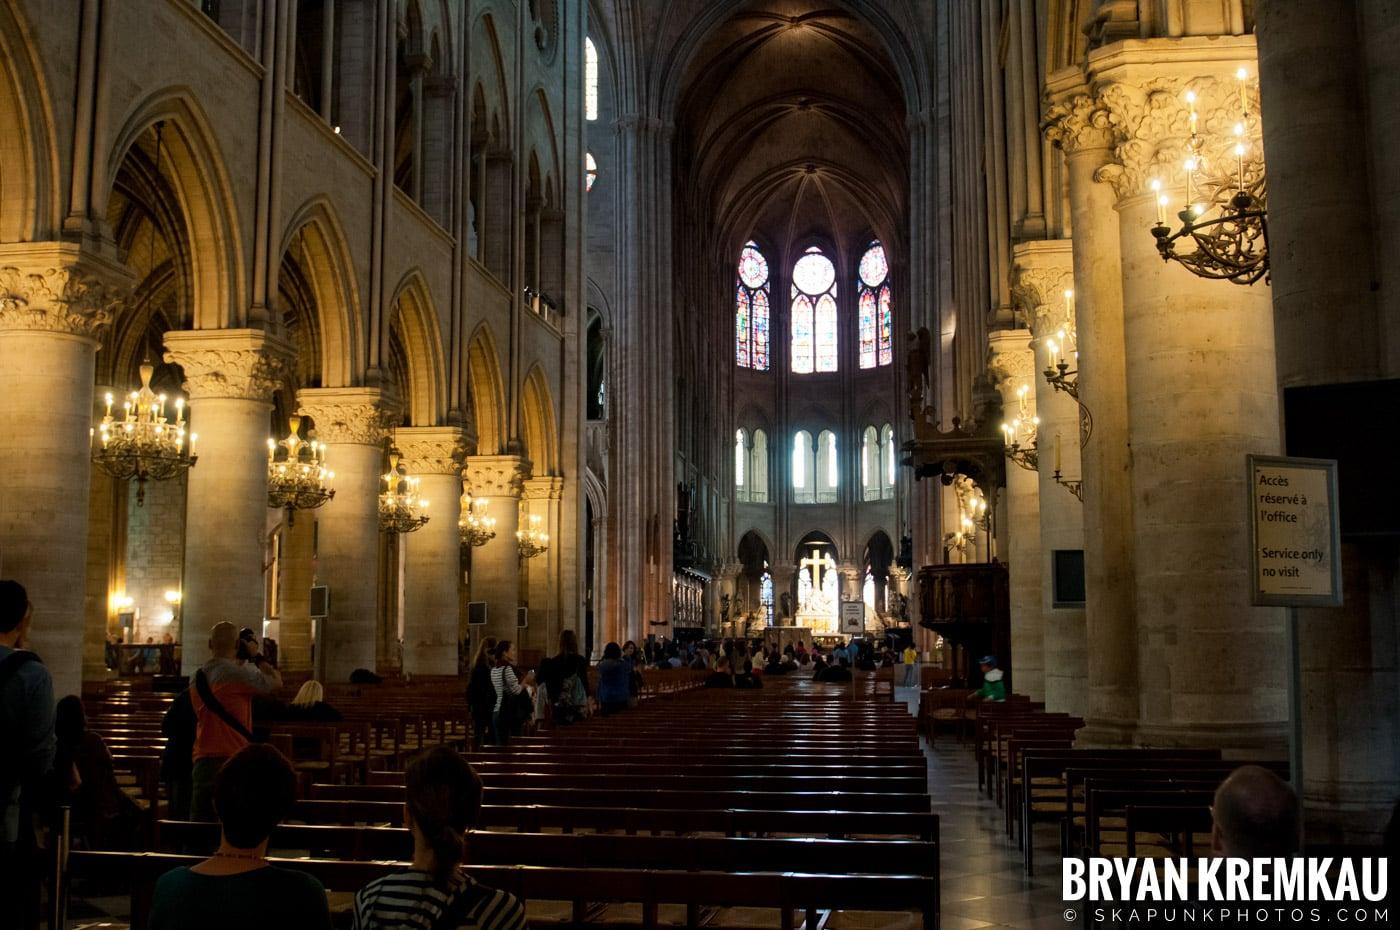 Paris, France Honeymoon - Day 5 - 7.22.11 (51)